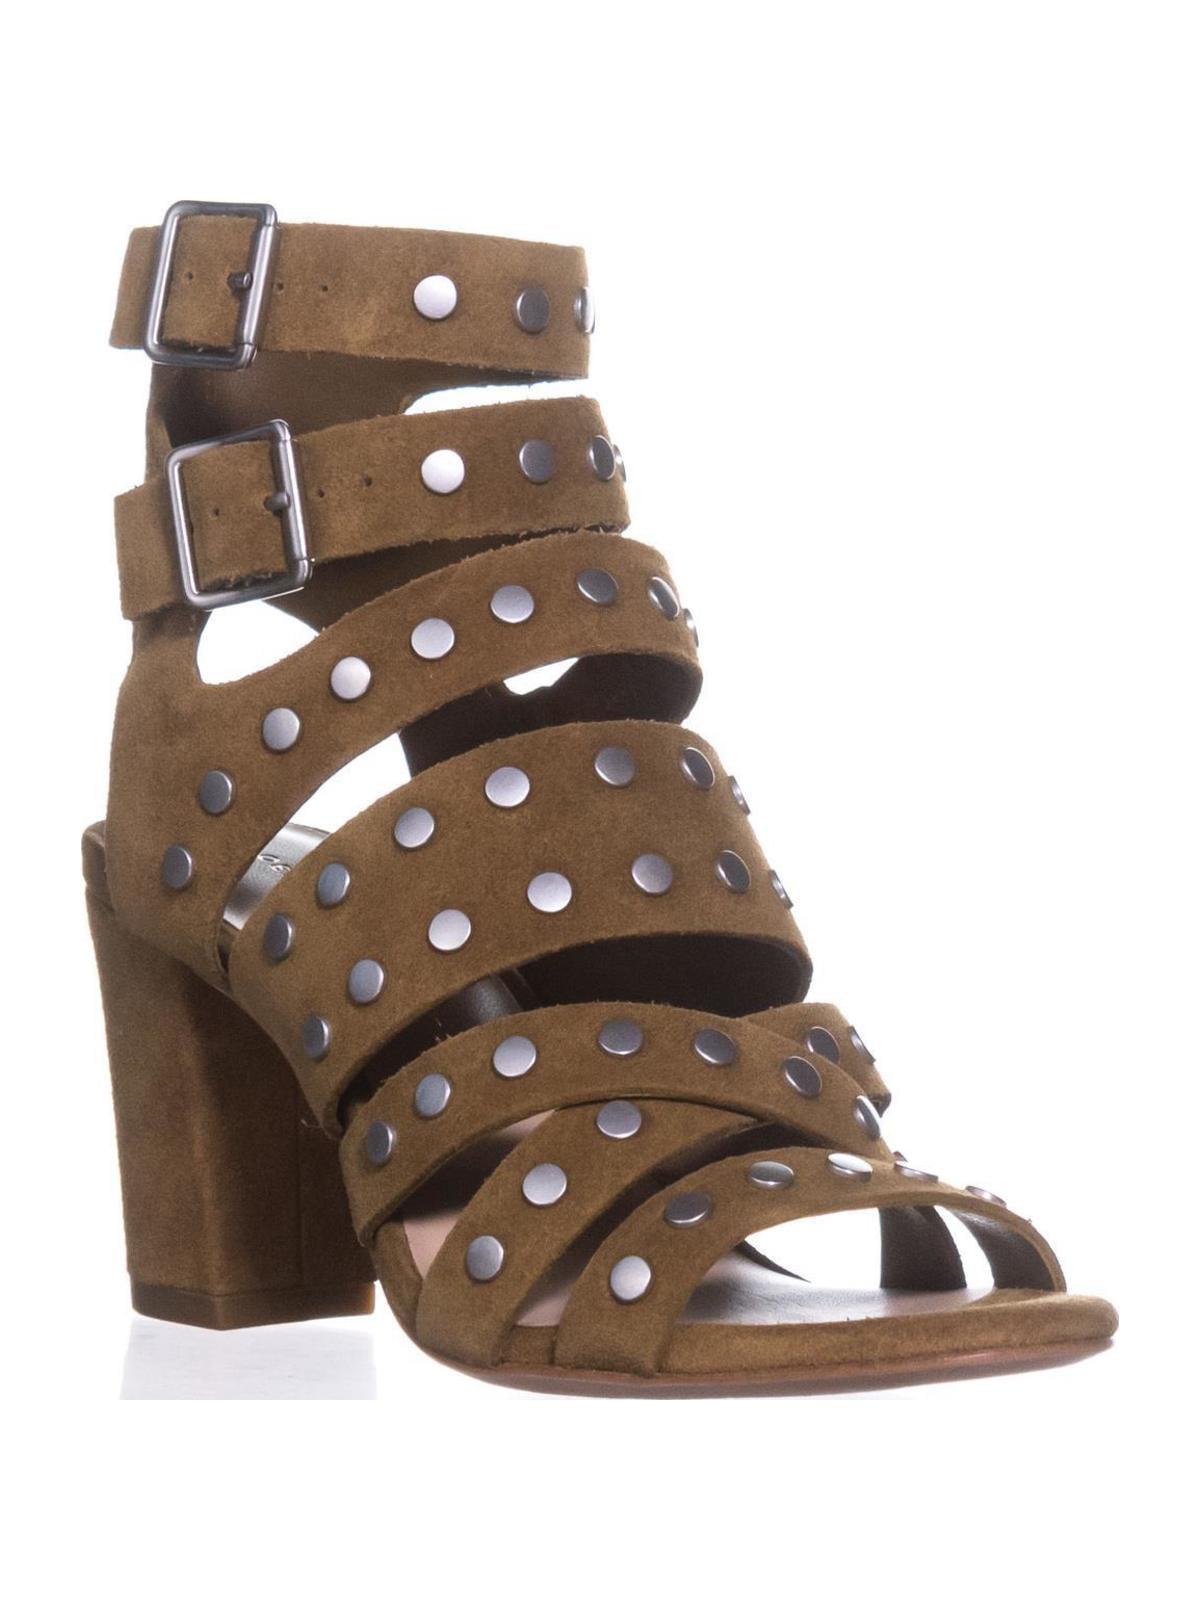 Womens Loeffler Randall Galia Gladiator US Sandals, Sienna/Silver, 5.5 US Gladiator a6d12c